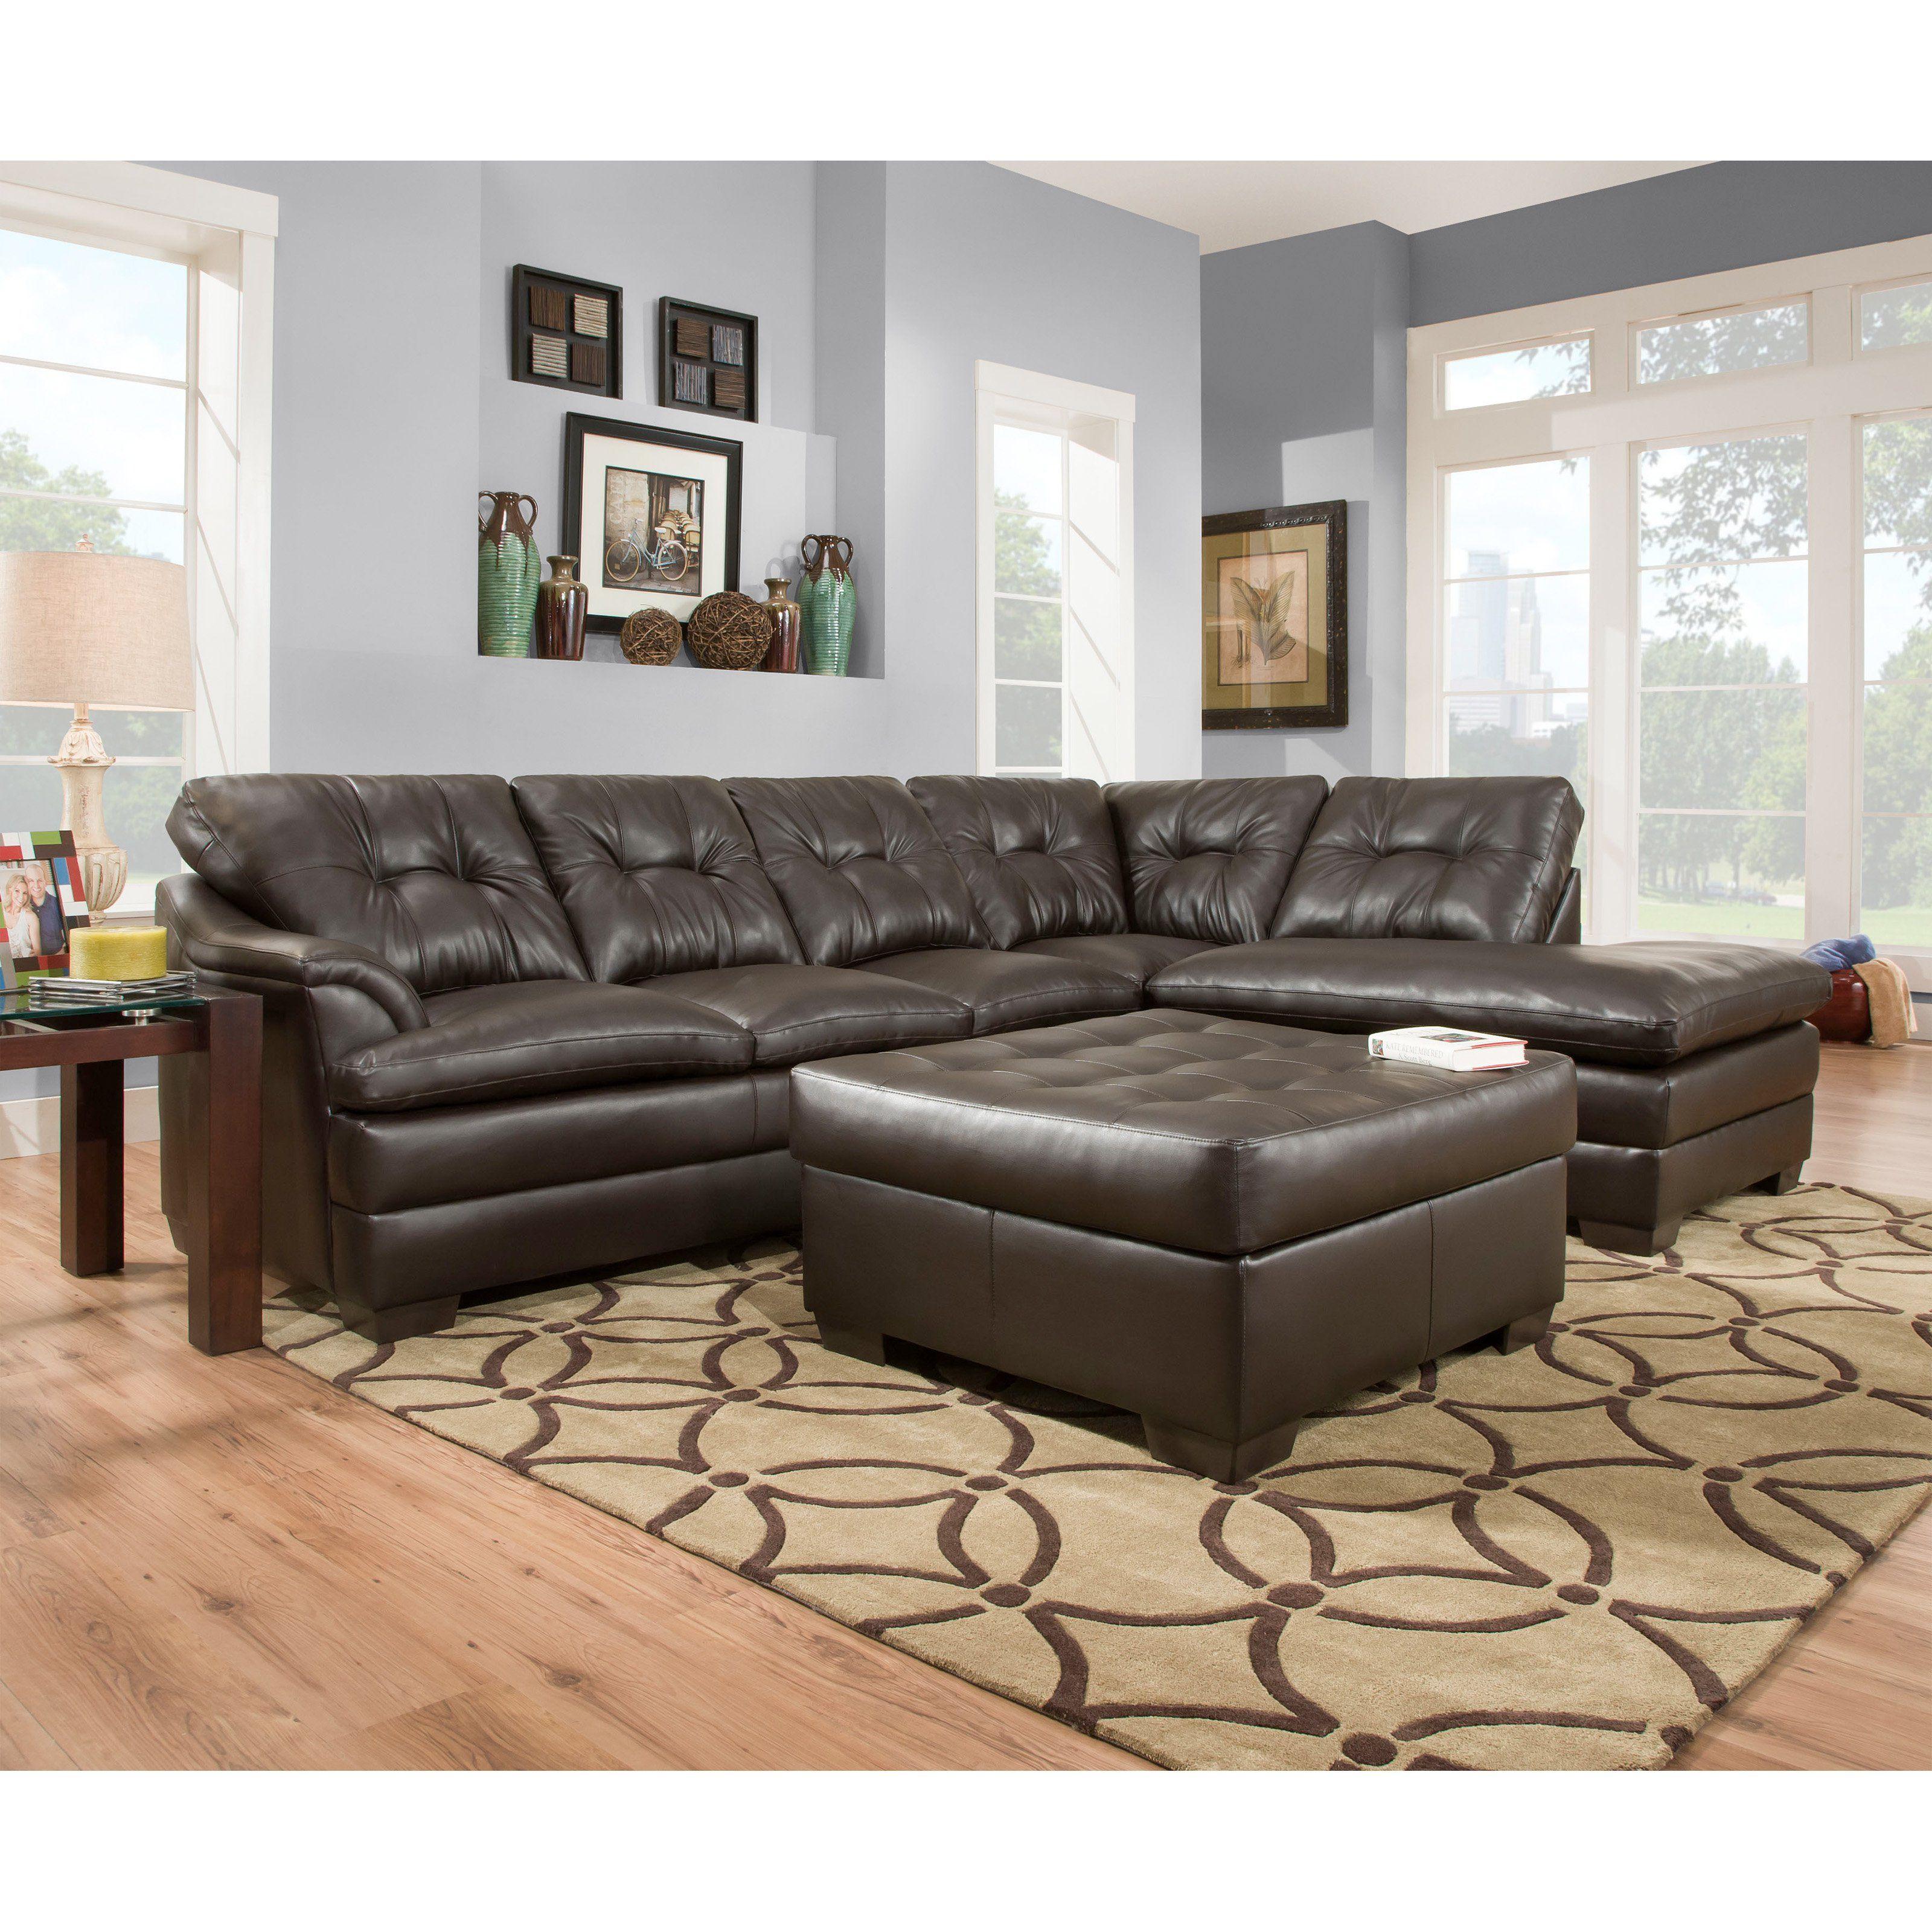 Www Mybob Com: Apollo Leather Motion Sofa Reviews